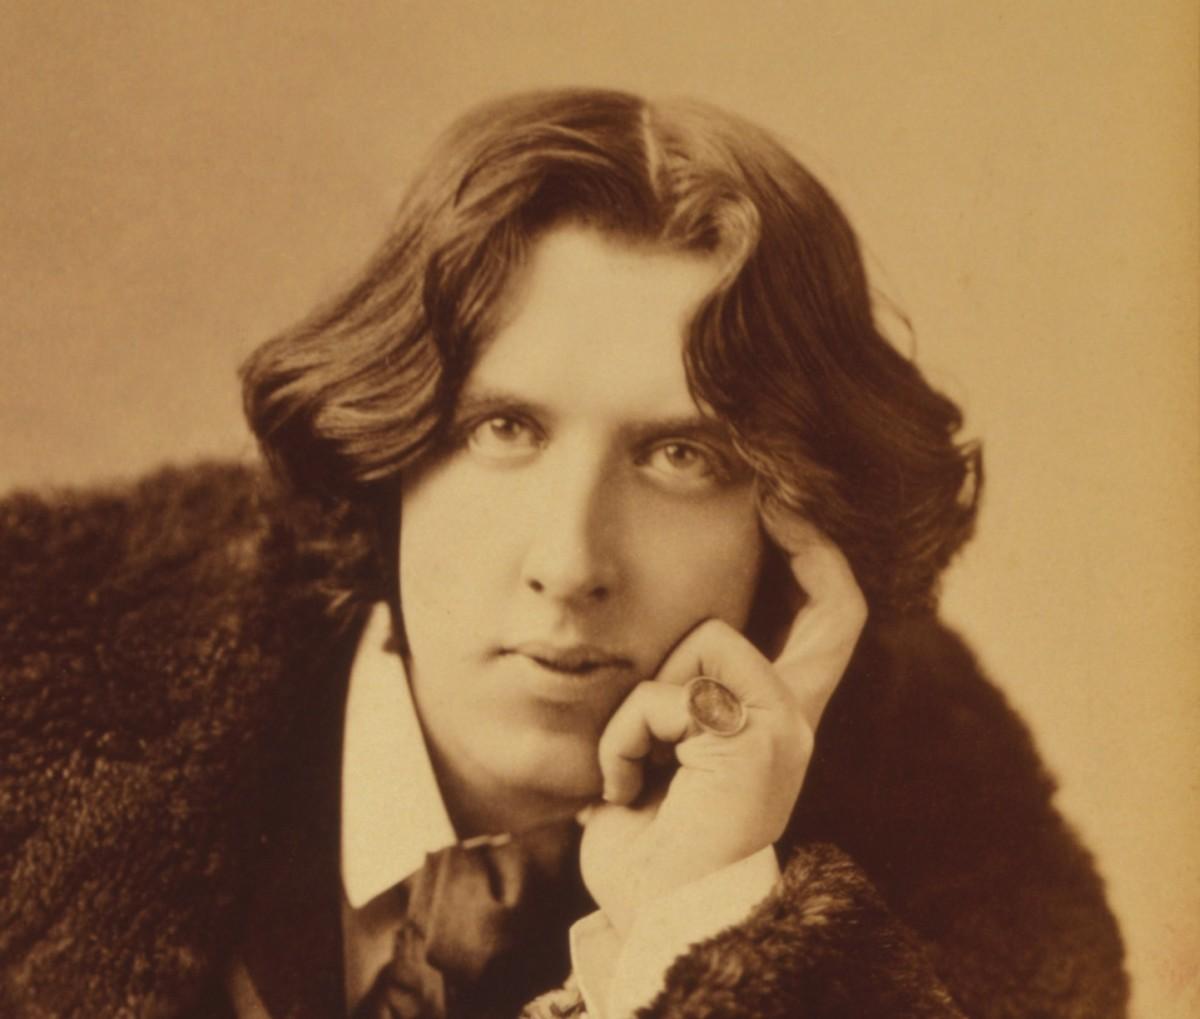 Oscar Wilde born 16 October 1854 died 30 November 1900